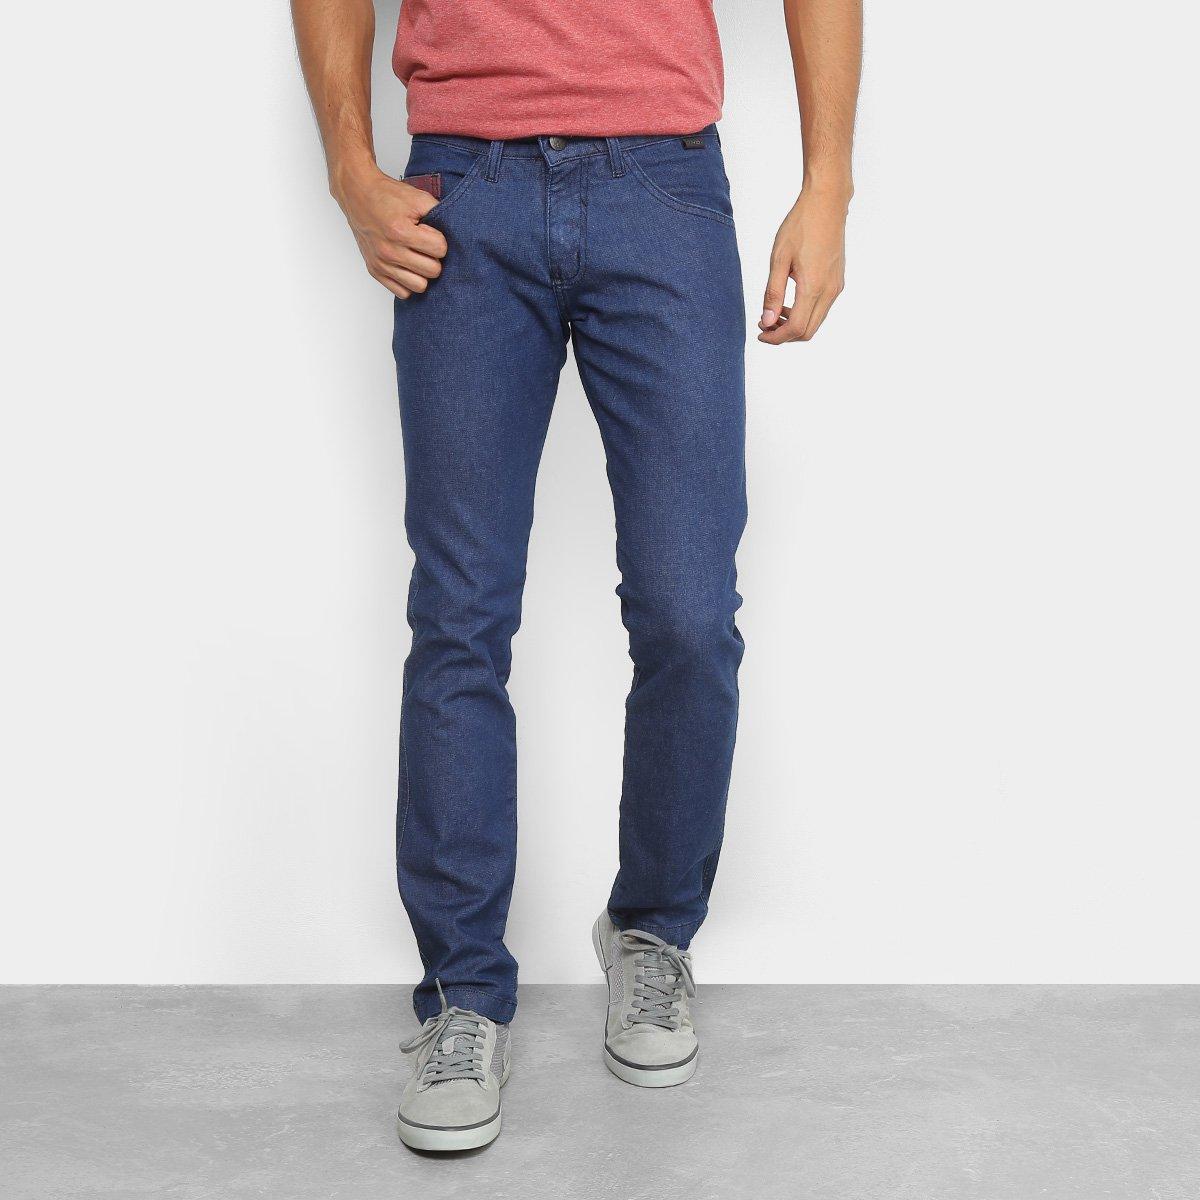 Calça Jeans HD Blazing Masculina